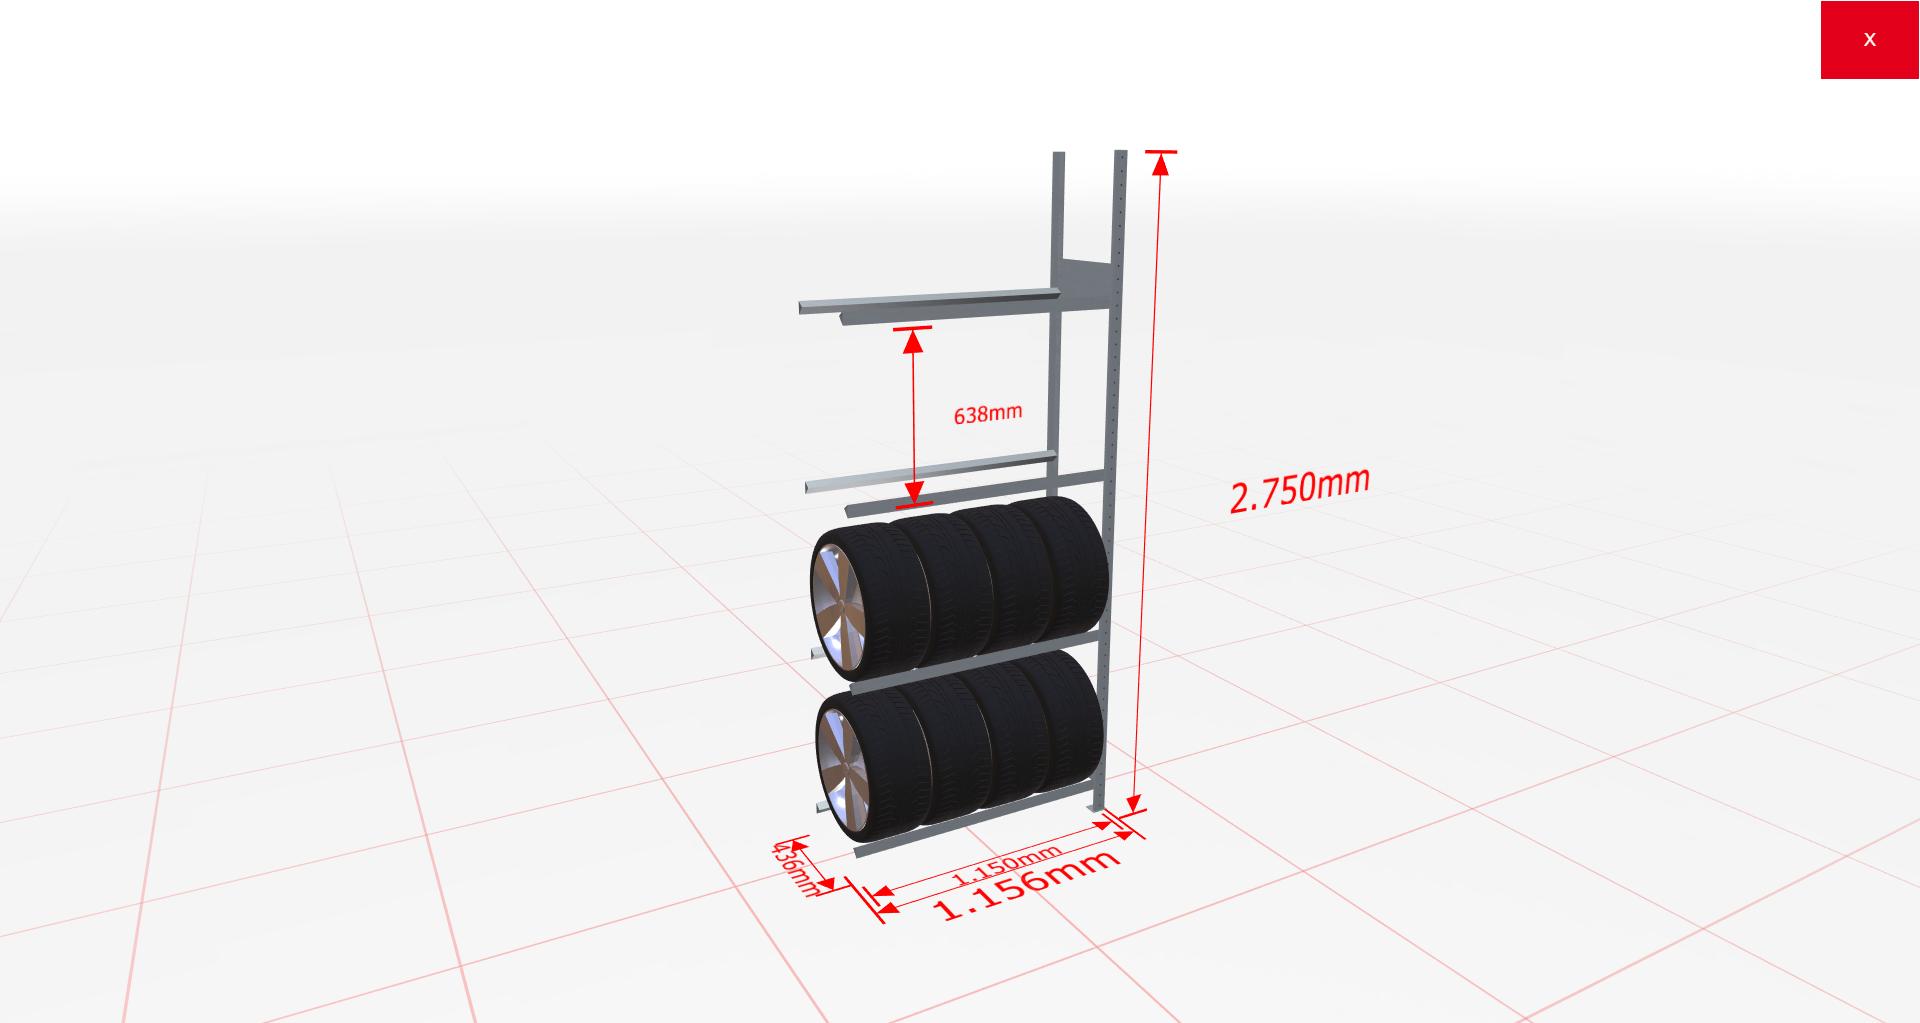 Räderregal Anbauregal SCHULTE Lagertechnik 2750x1150x400 mm – 4 Ebenen á 1150 mm, verzinkt